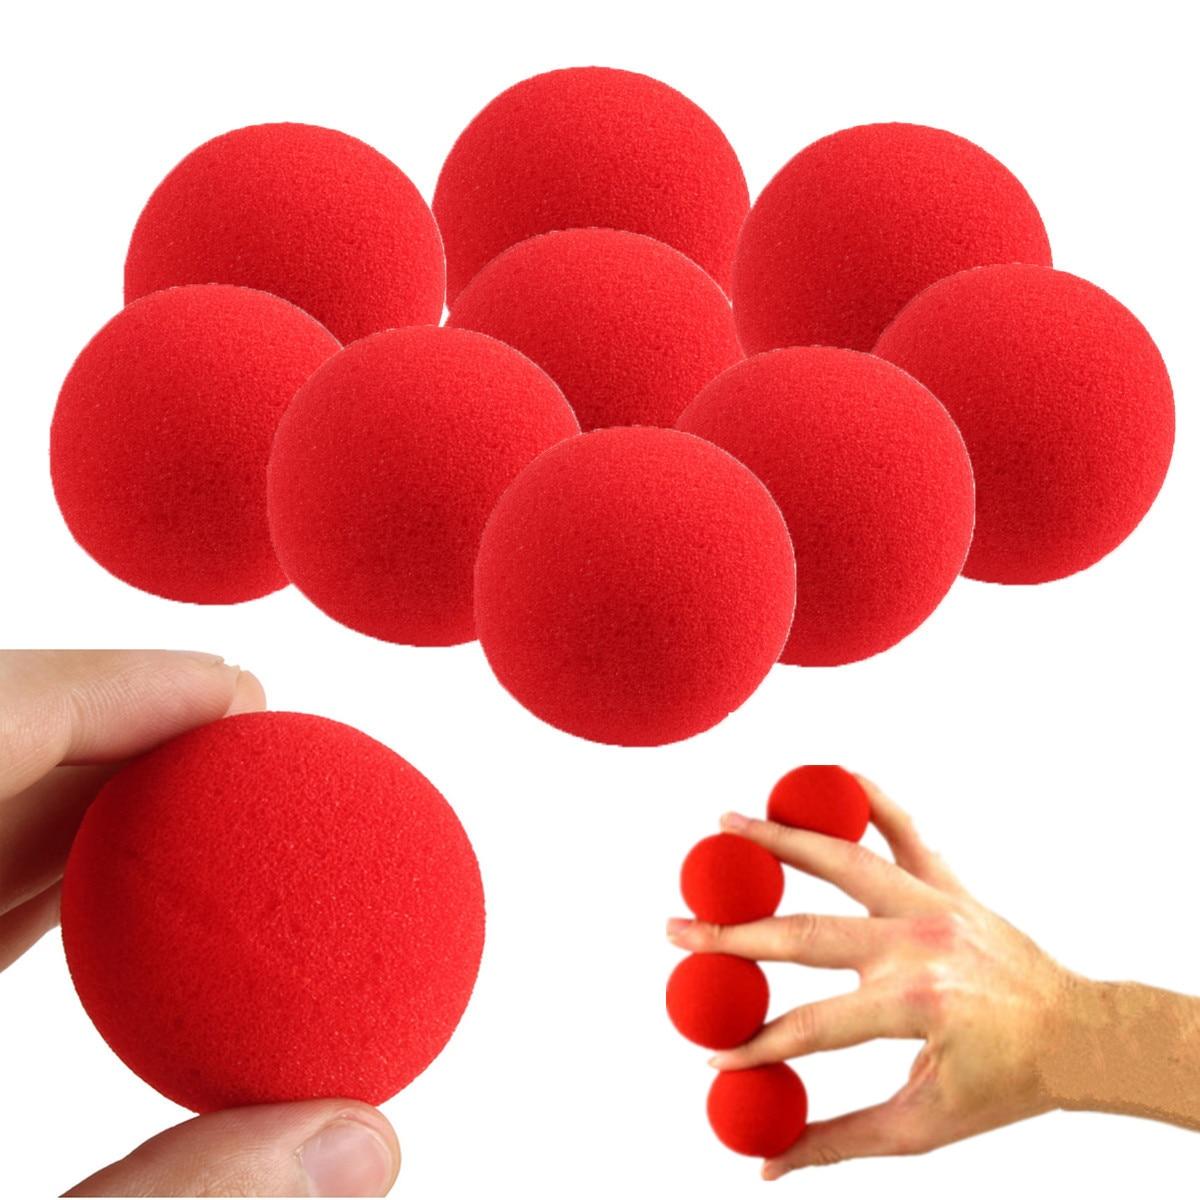 10PCs/lot High Quality 4.5cm New Fashion Close-Up Magic Sponge Ball Brand Street Classical Comedy Trick Soft Red Sponge Ball Toy(China)